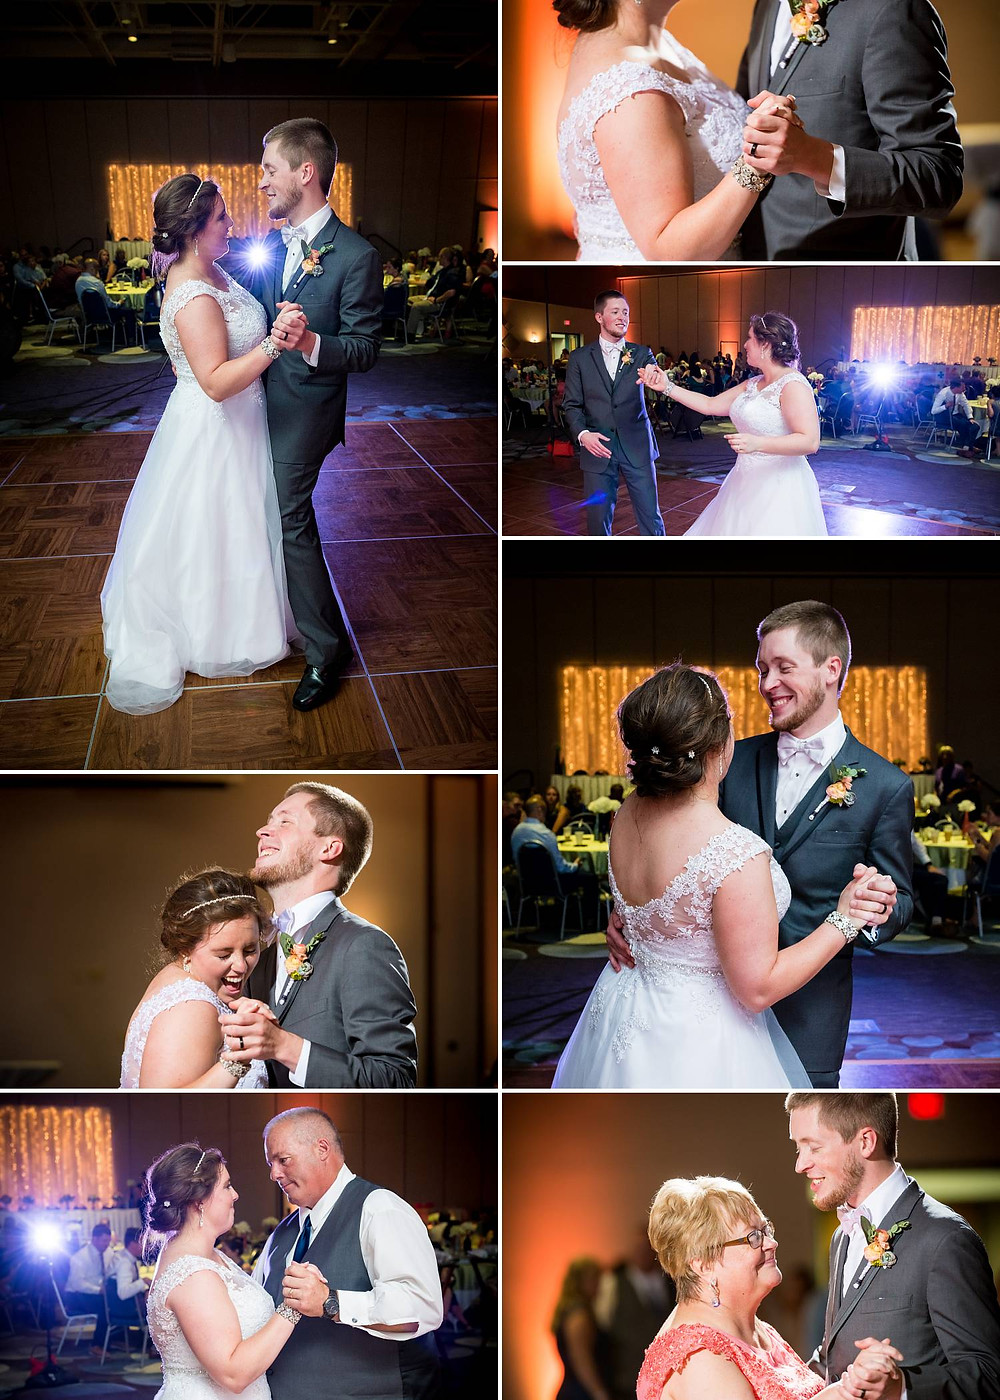 Oshkosh Convention Center Wedding First Dance | Lanari Photography